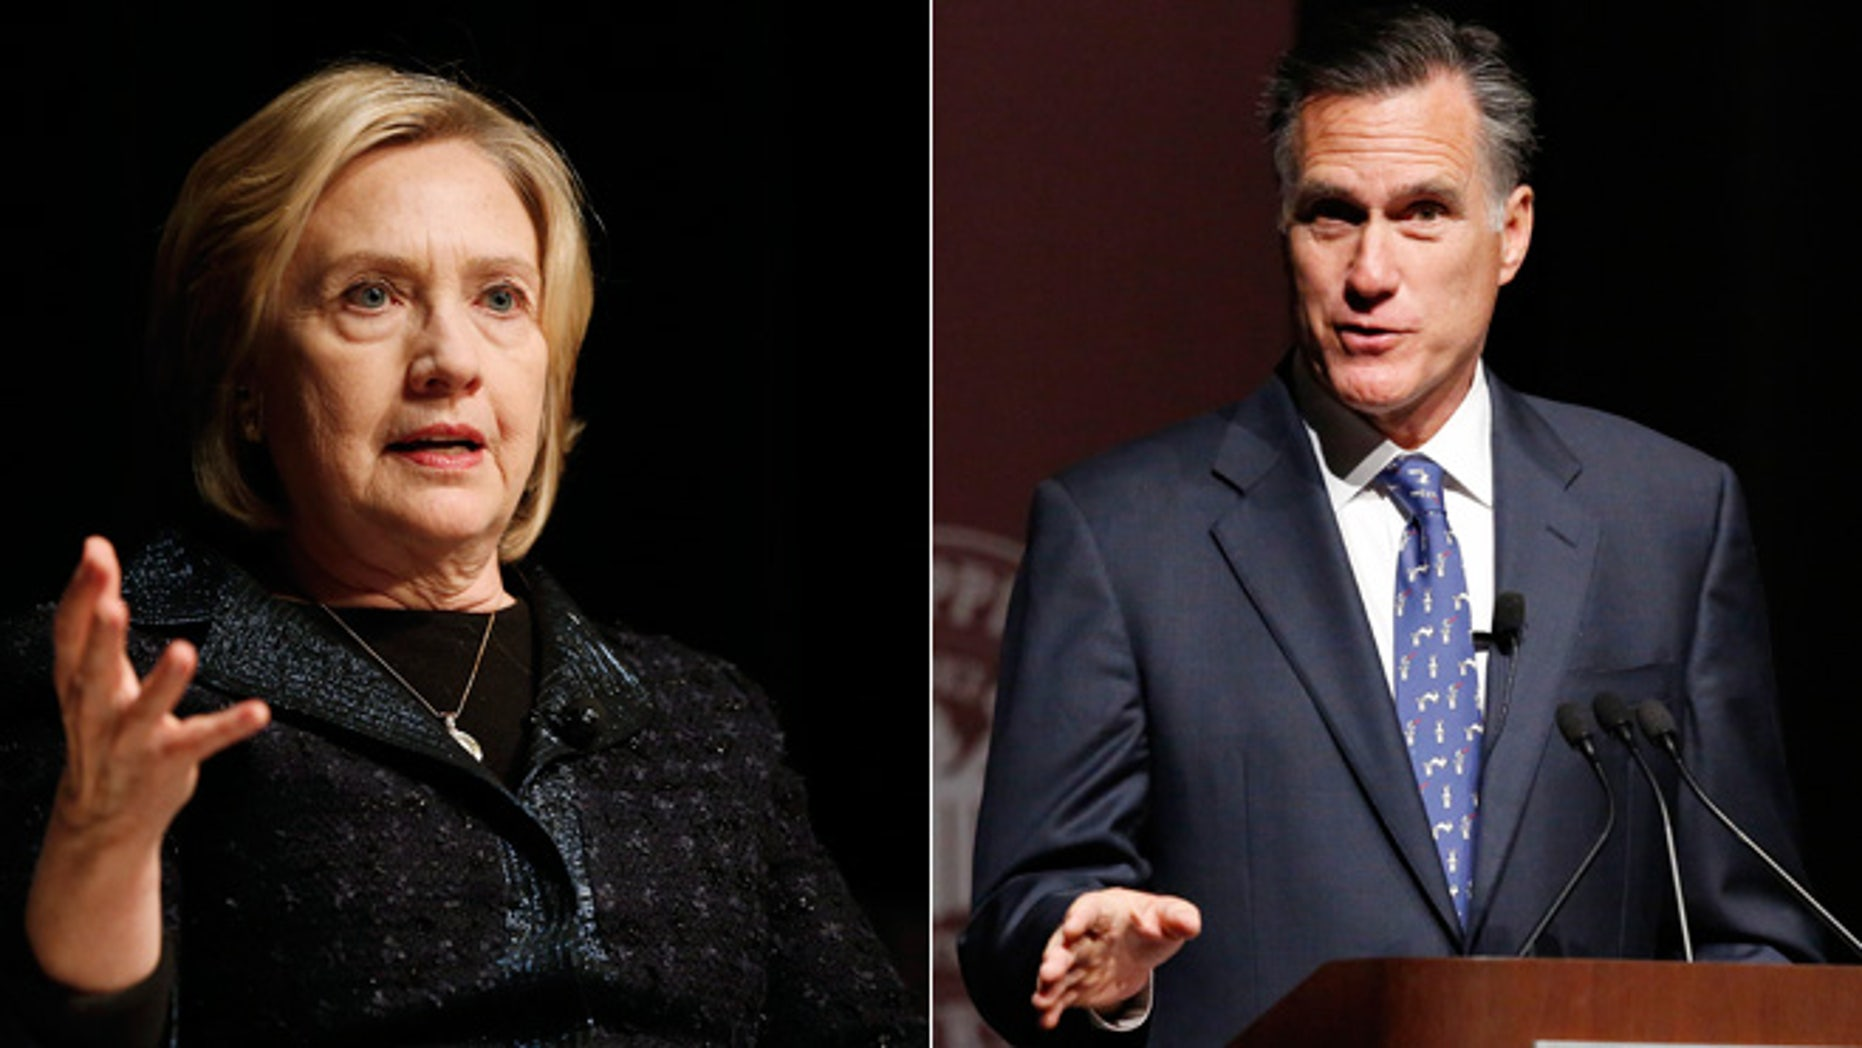 Shown above: Former Secretary of State Hillary Clinton (left) and former Massachusetts Governor Mitt Romney (right).